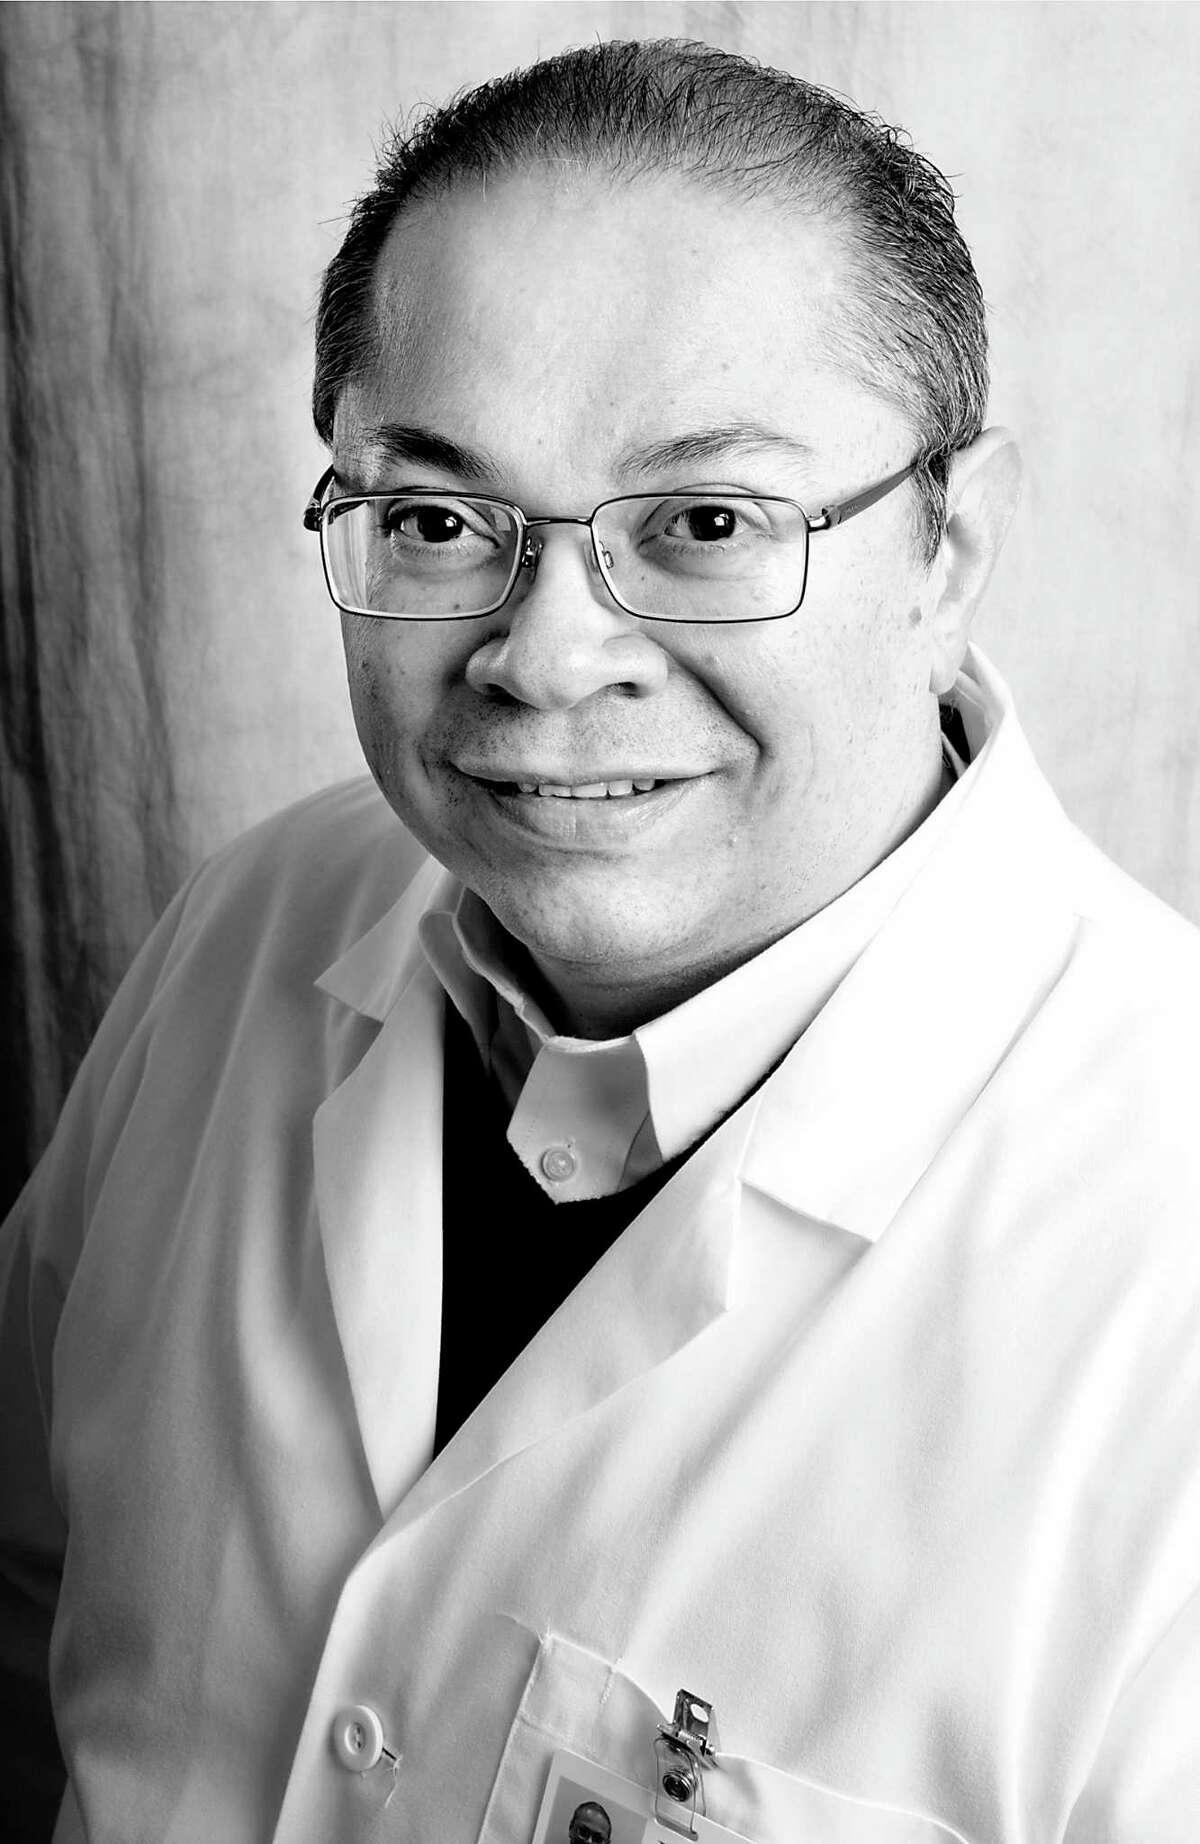 Dr. Humberto Perez